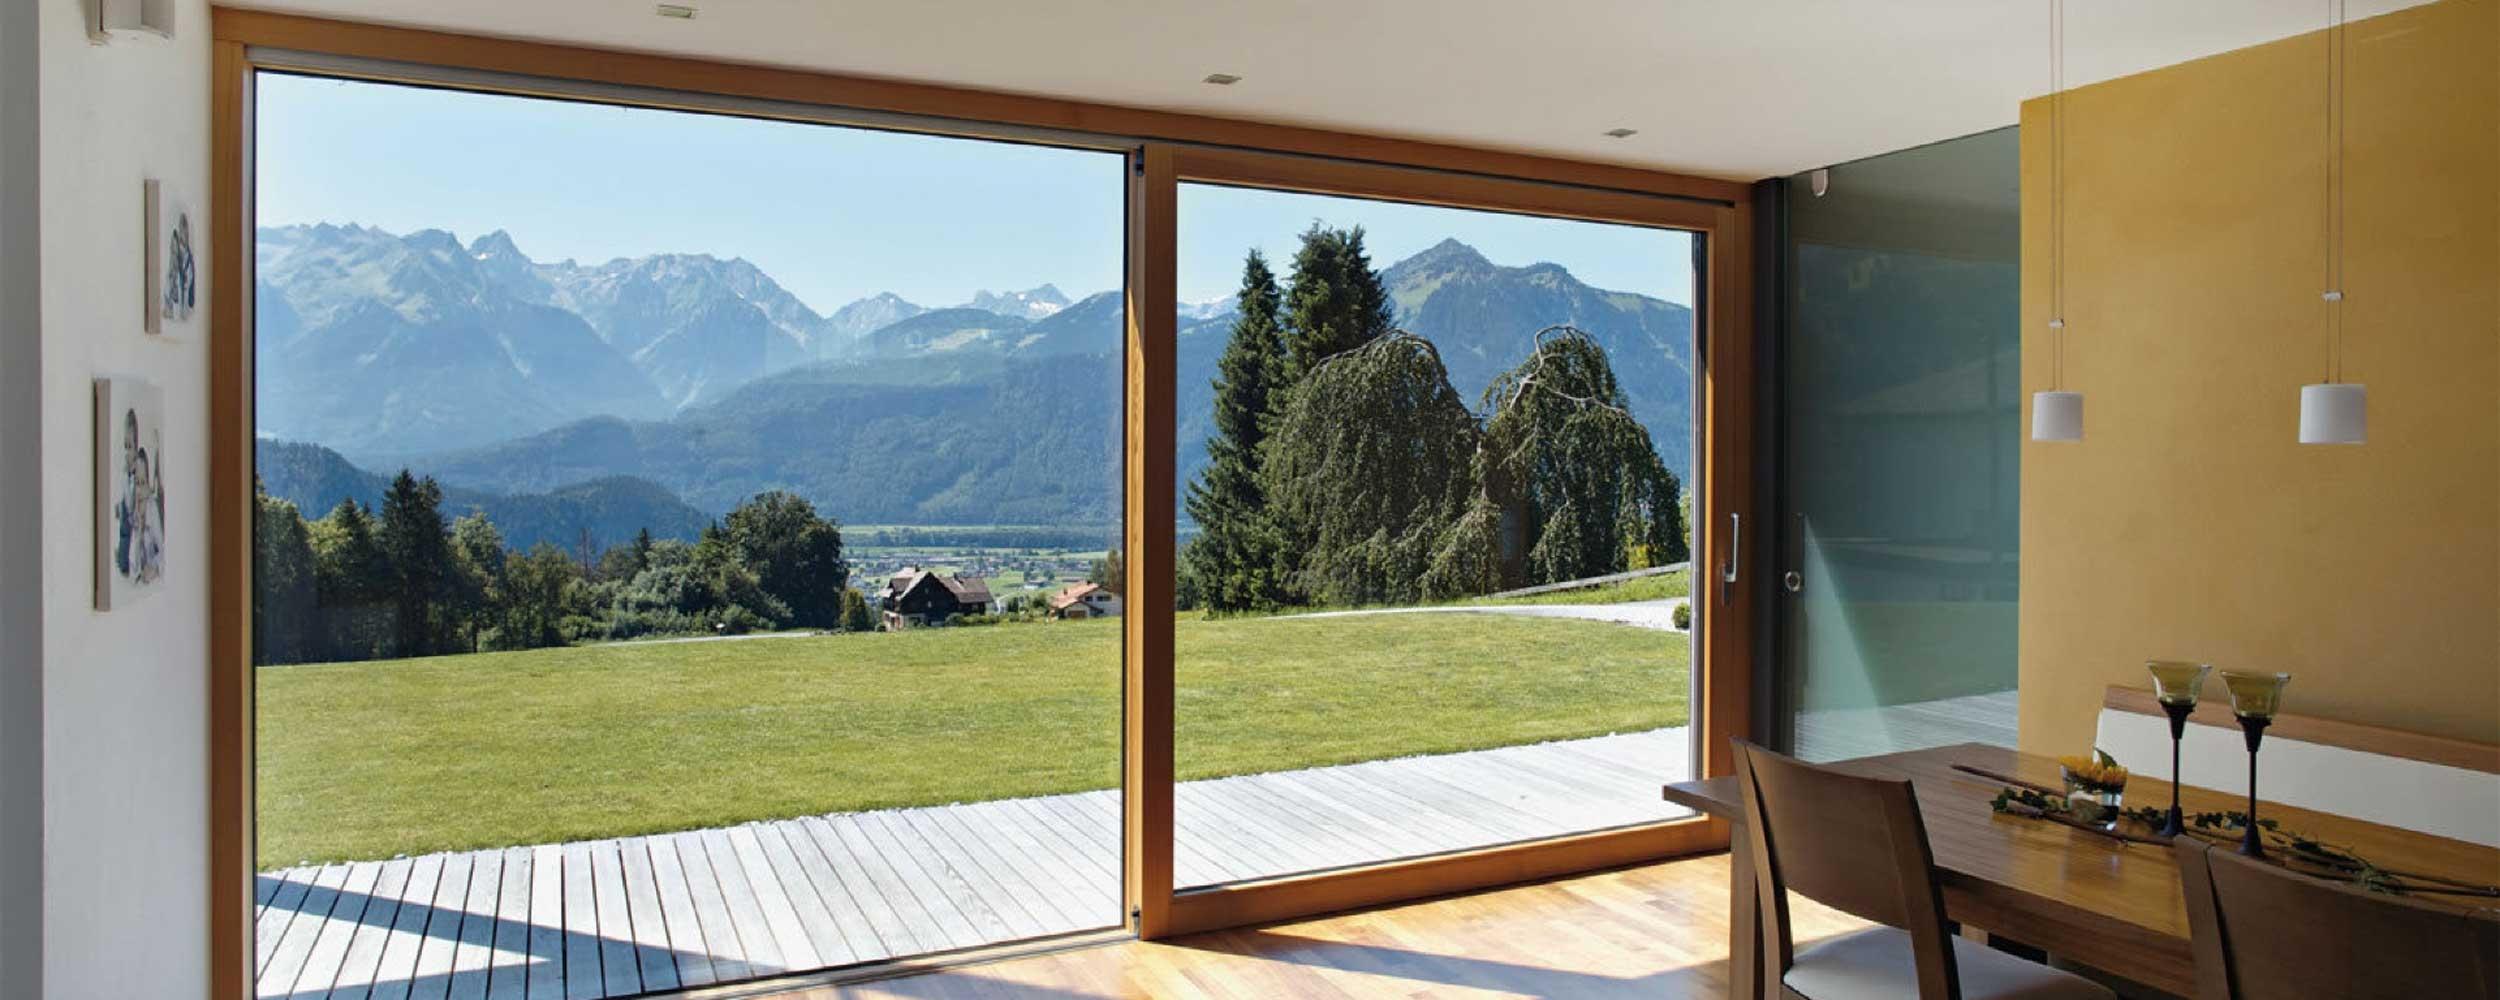 doors-windows-gaulhofer-lift-slide-banner